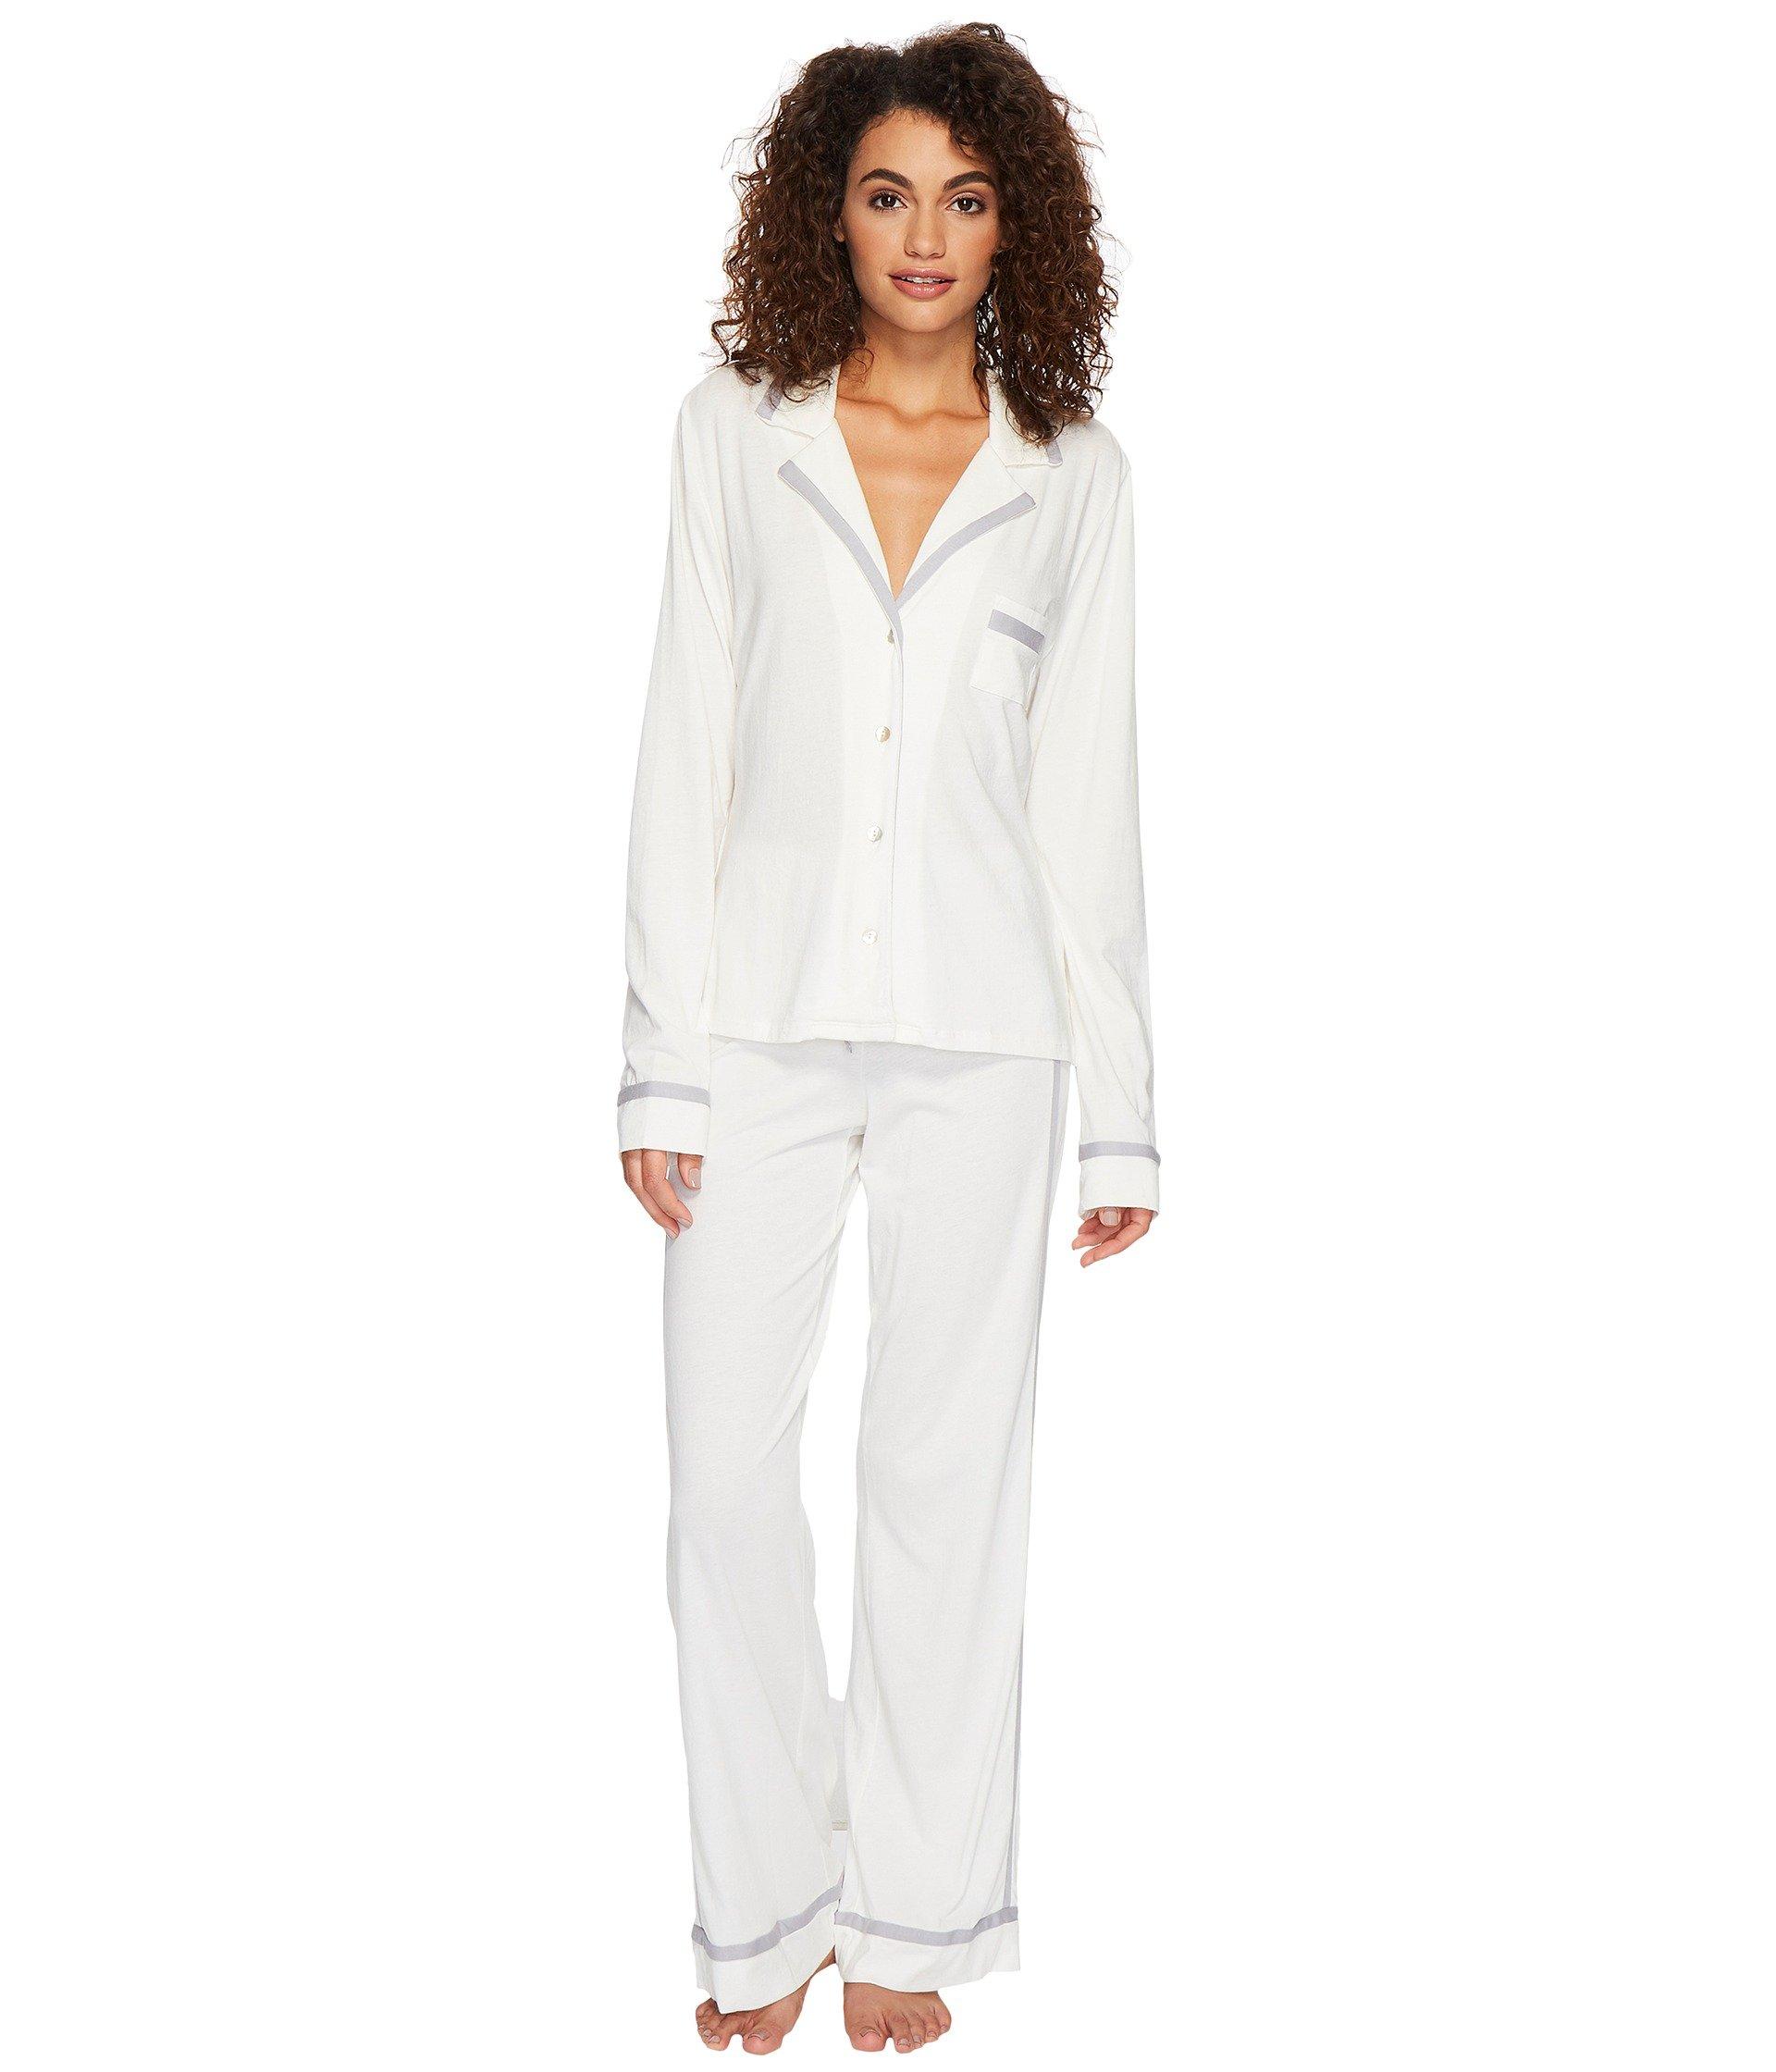 c1e84c00b51c Cosabella Bella Amore Long Sleeve Top Pants Pj Set In Moon Ivory ...